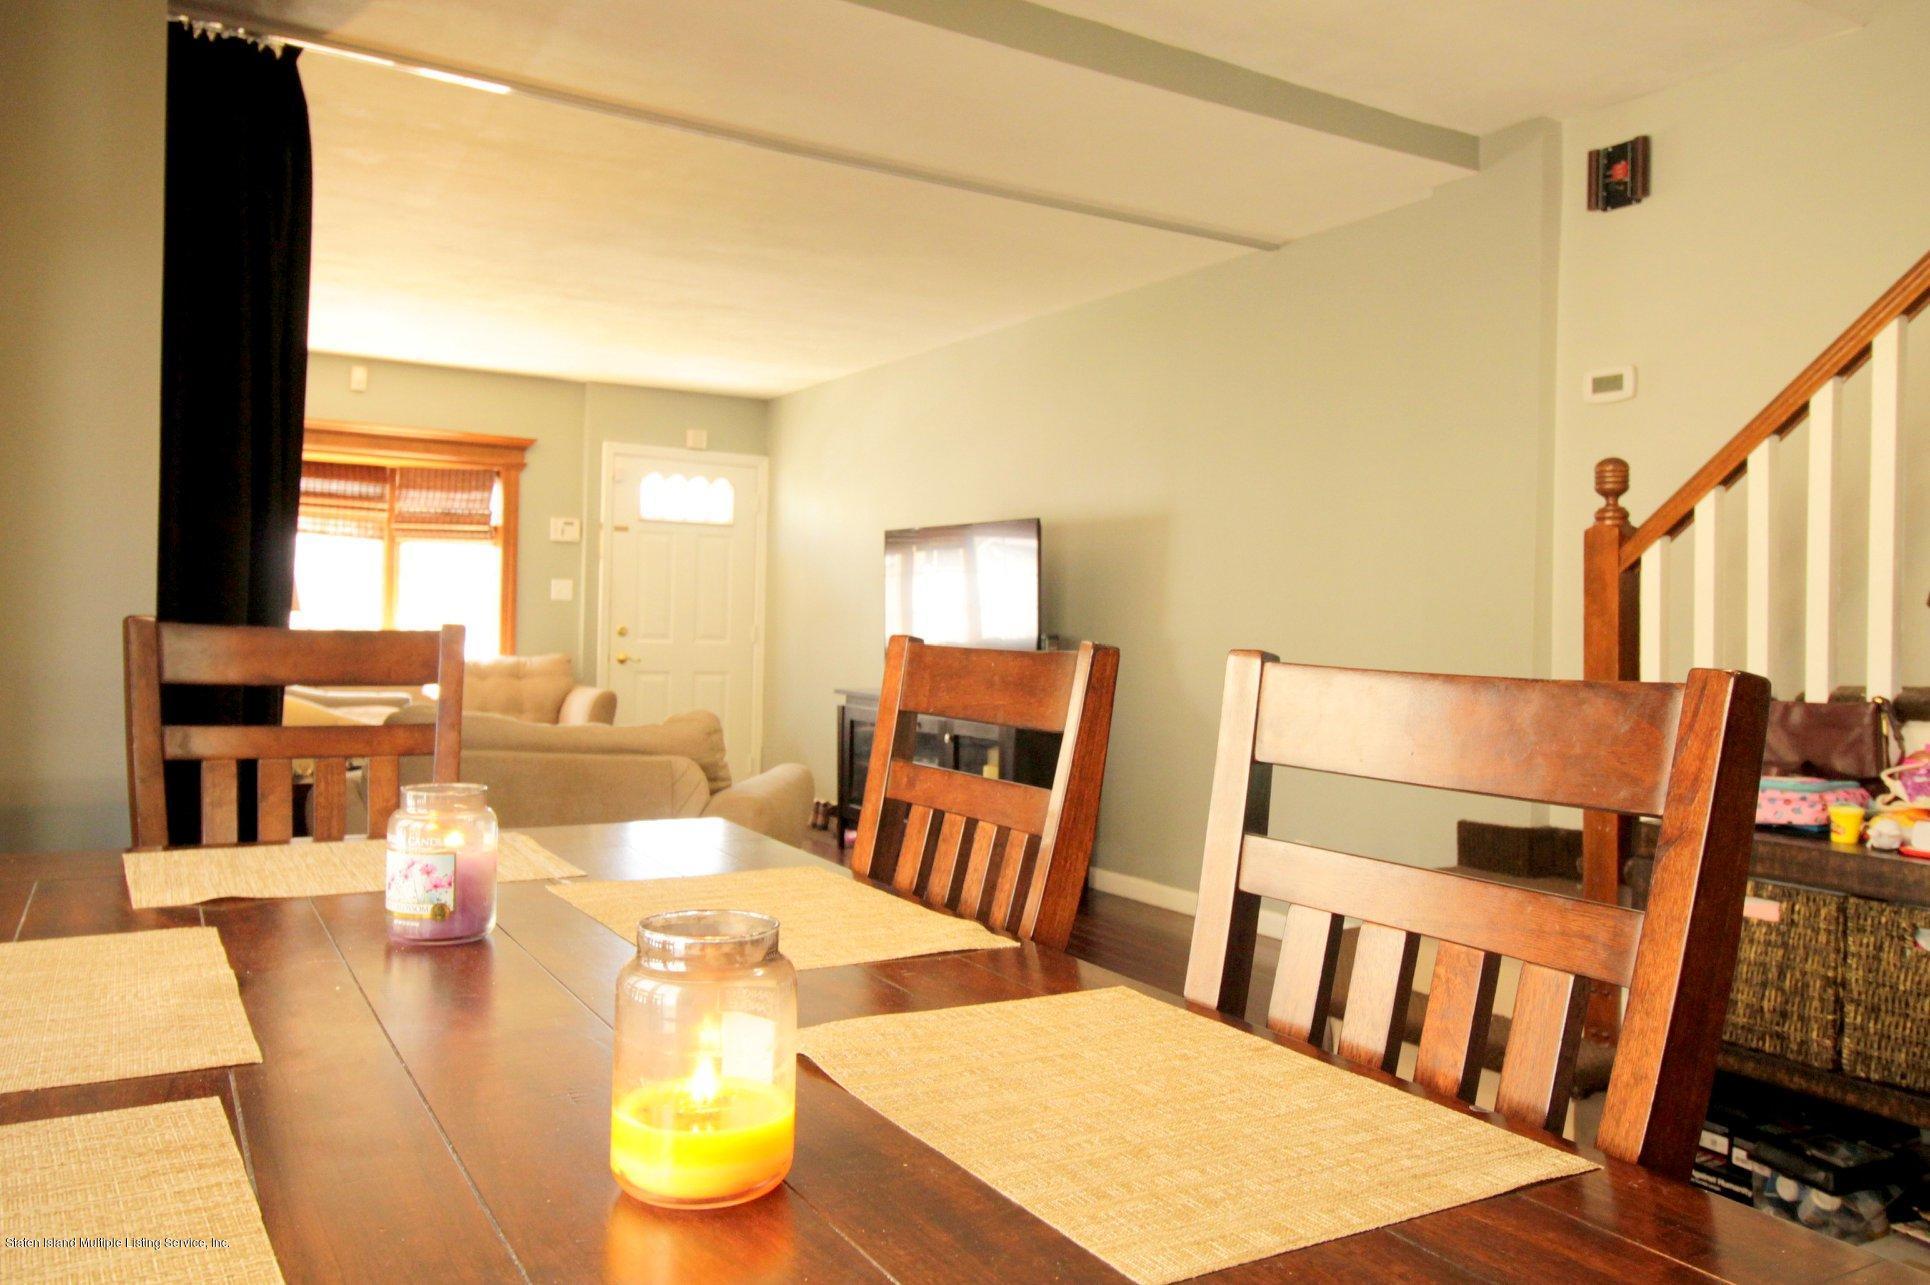 Single Family - Semi-Attached 155 Lathrop Avenue  Staten Island, NY 10314, MLS-1127919-3